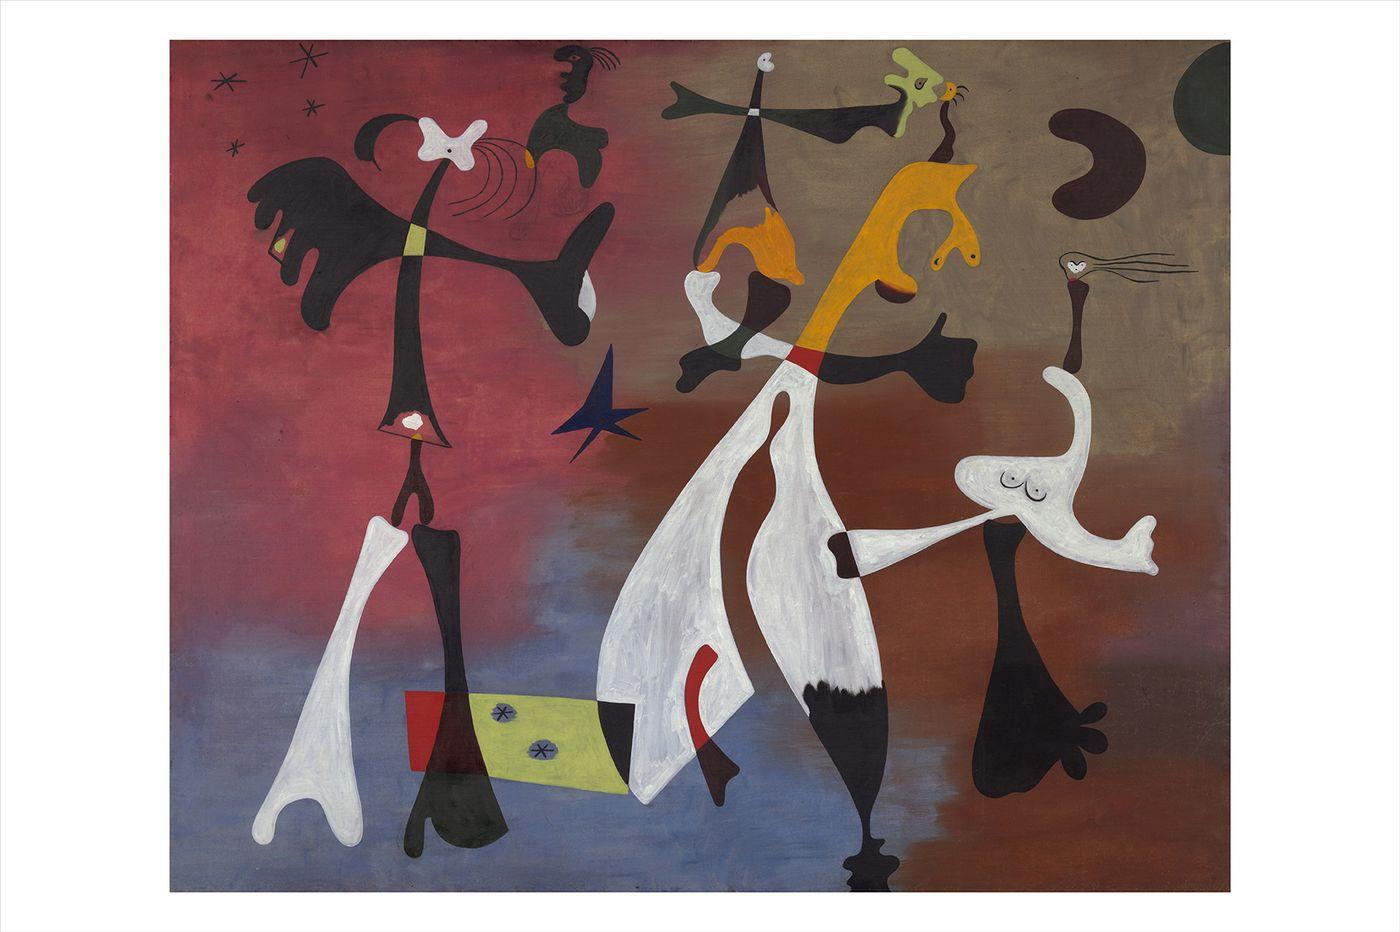 At Philadelphia art museums: Fabulous fabrics at Barnes Foundation, major Art Museum revamp